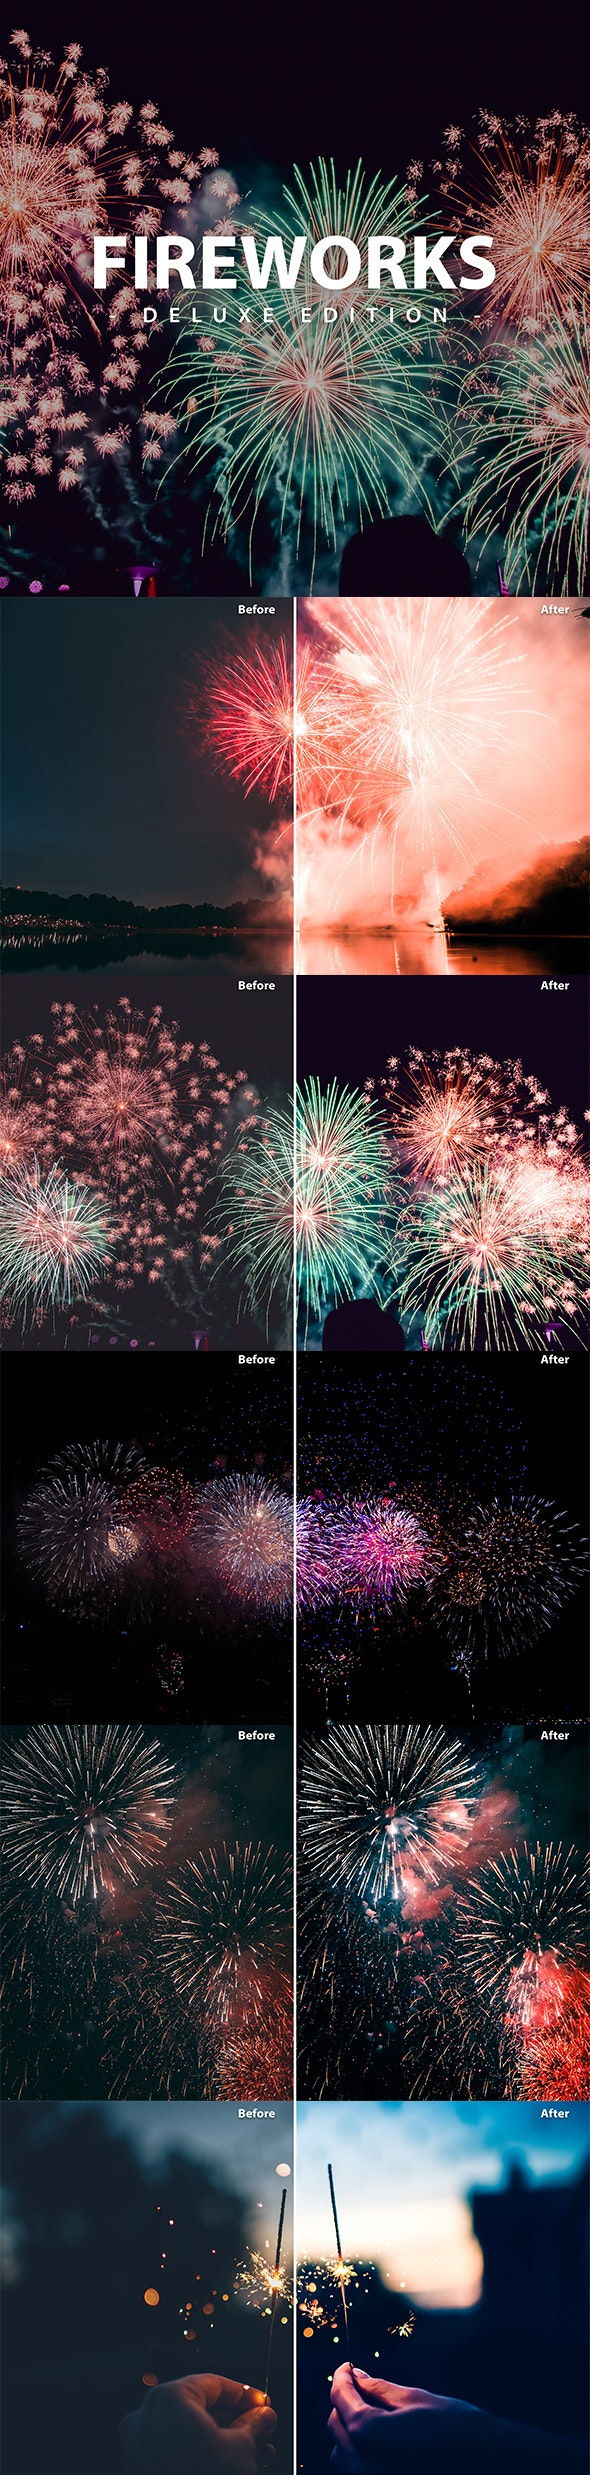 Fireworks Deluxe Edition   for Mobile and Desktop - Lightroom Presets Add-ons